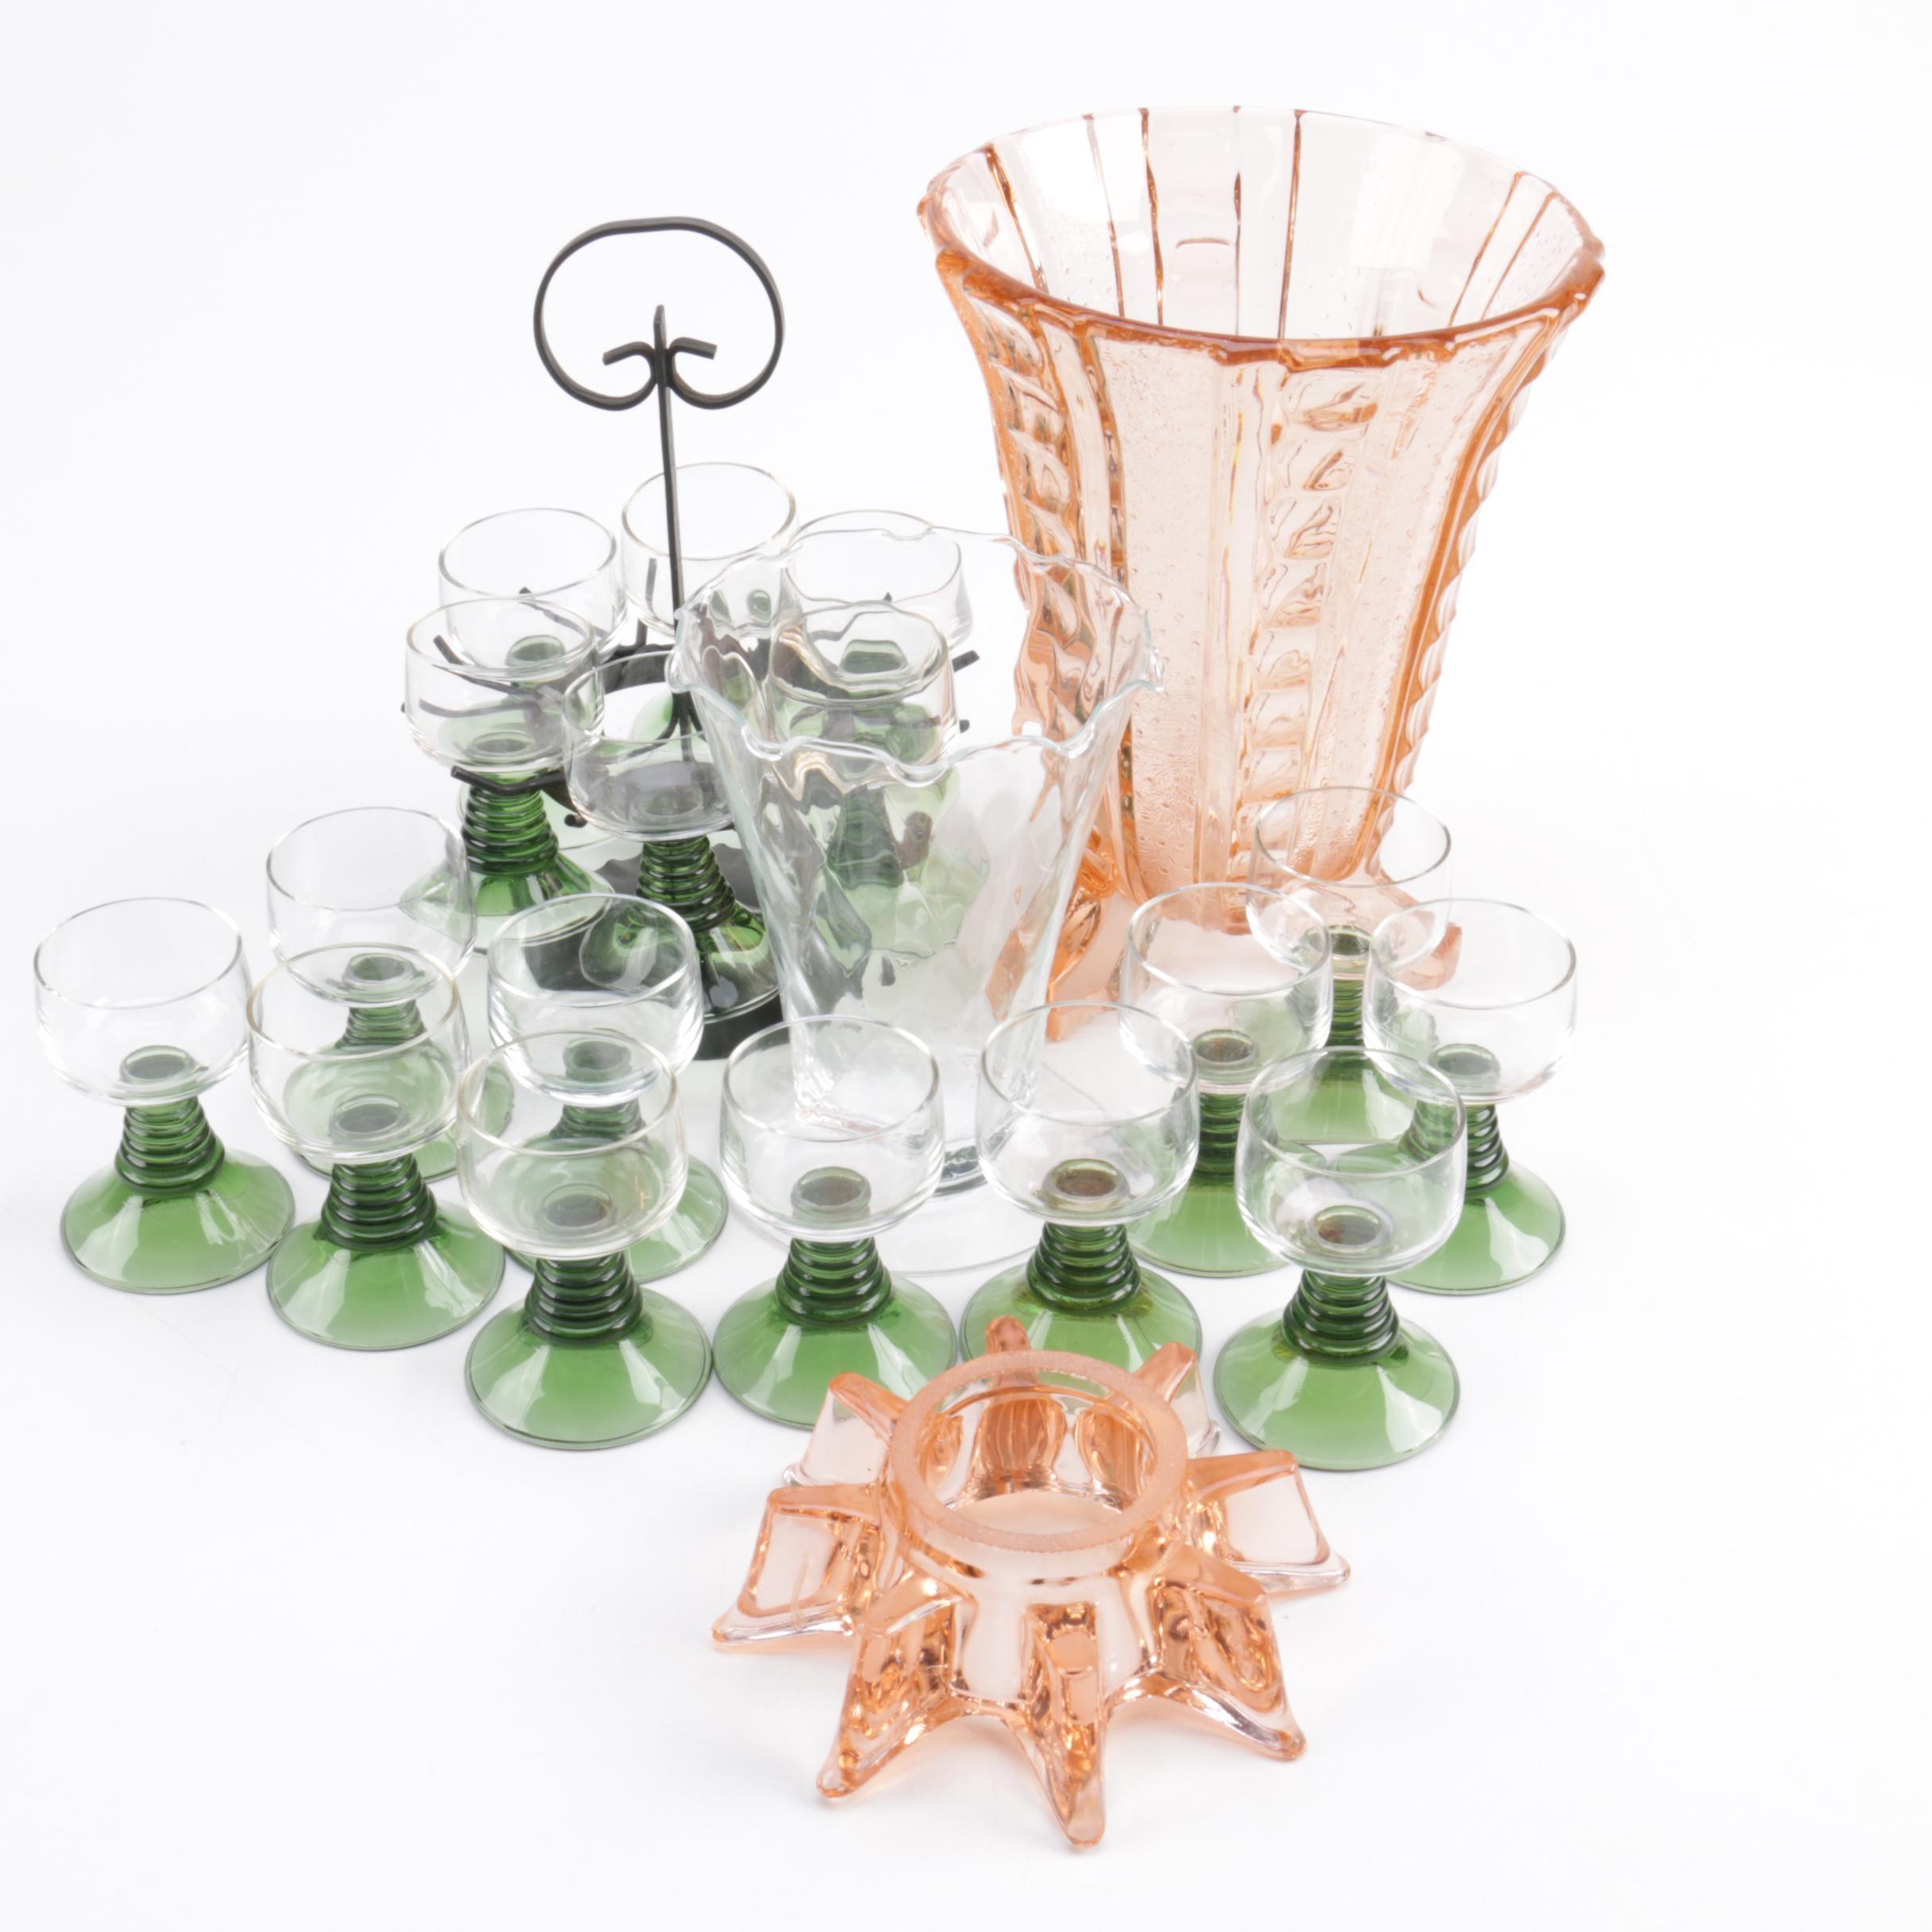 German Roemer Stemware and Depression Glass Tableware